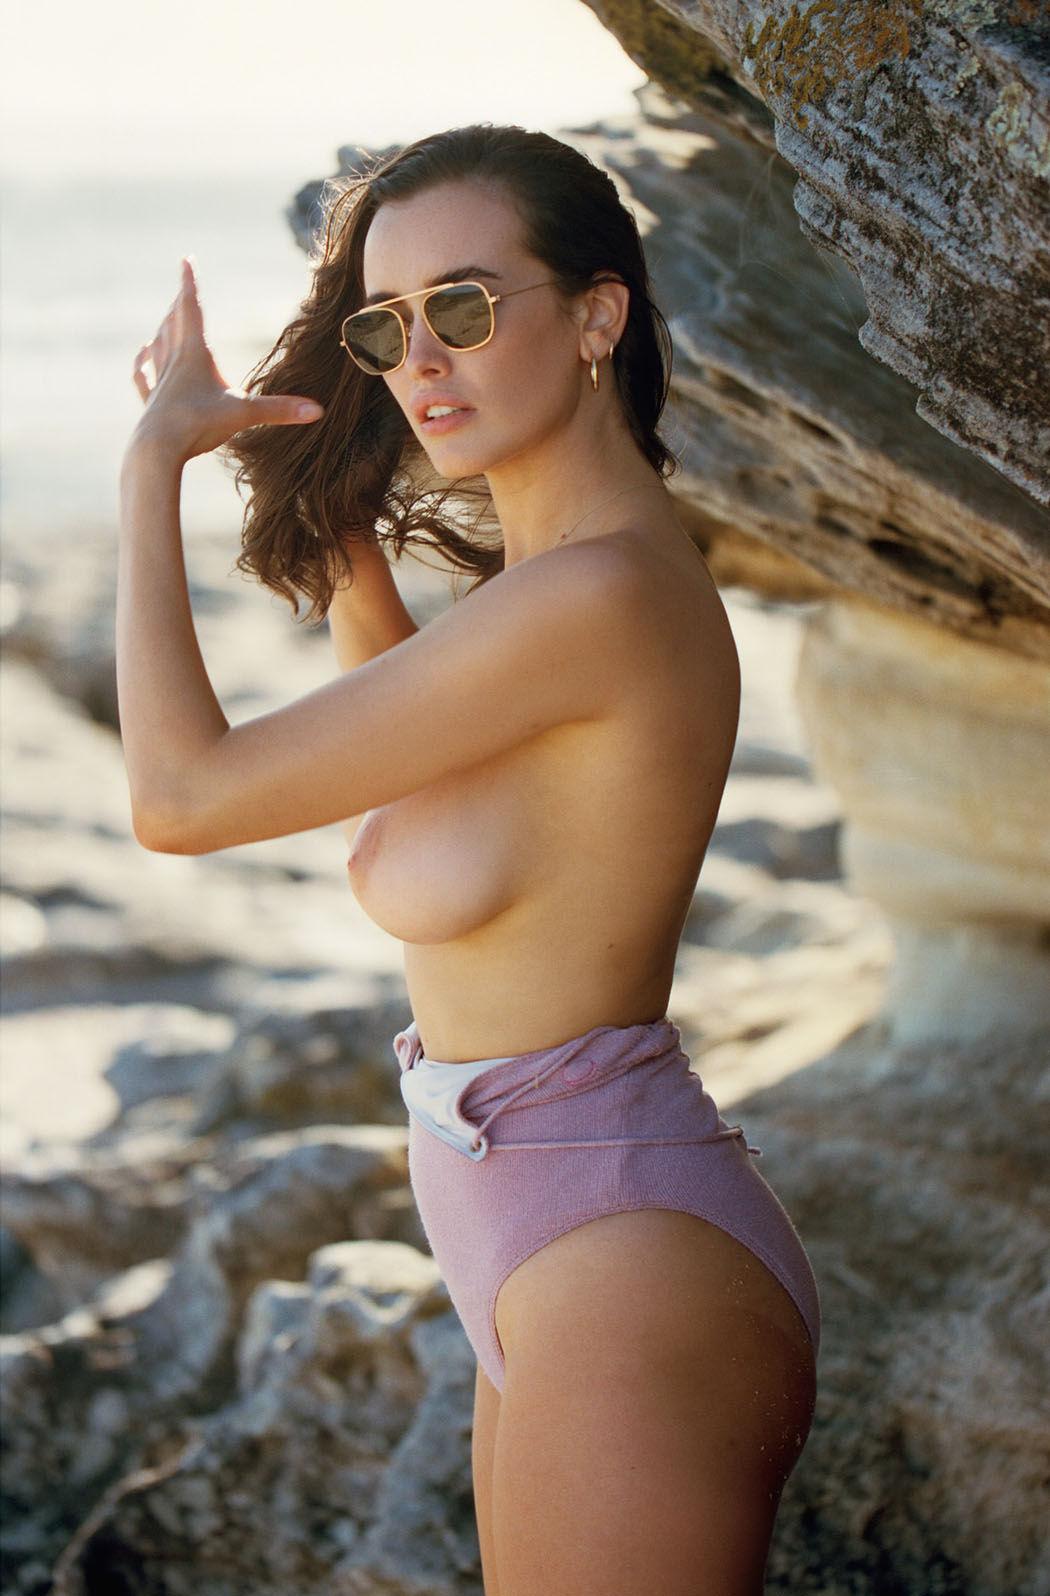 Australian model madeline relph nude photos